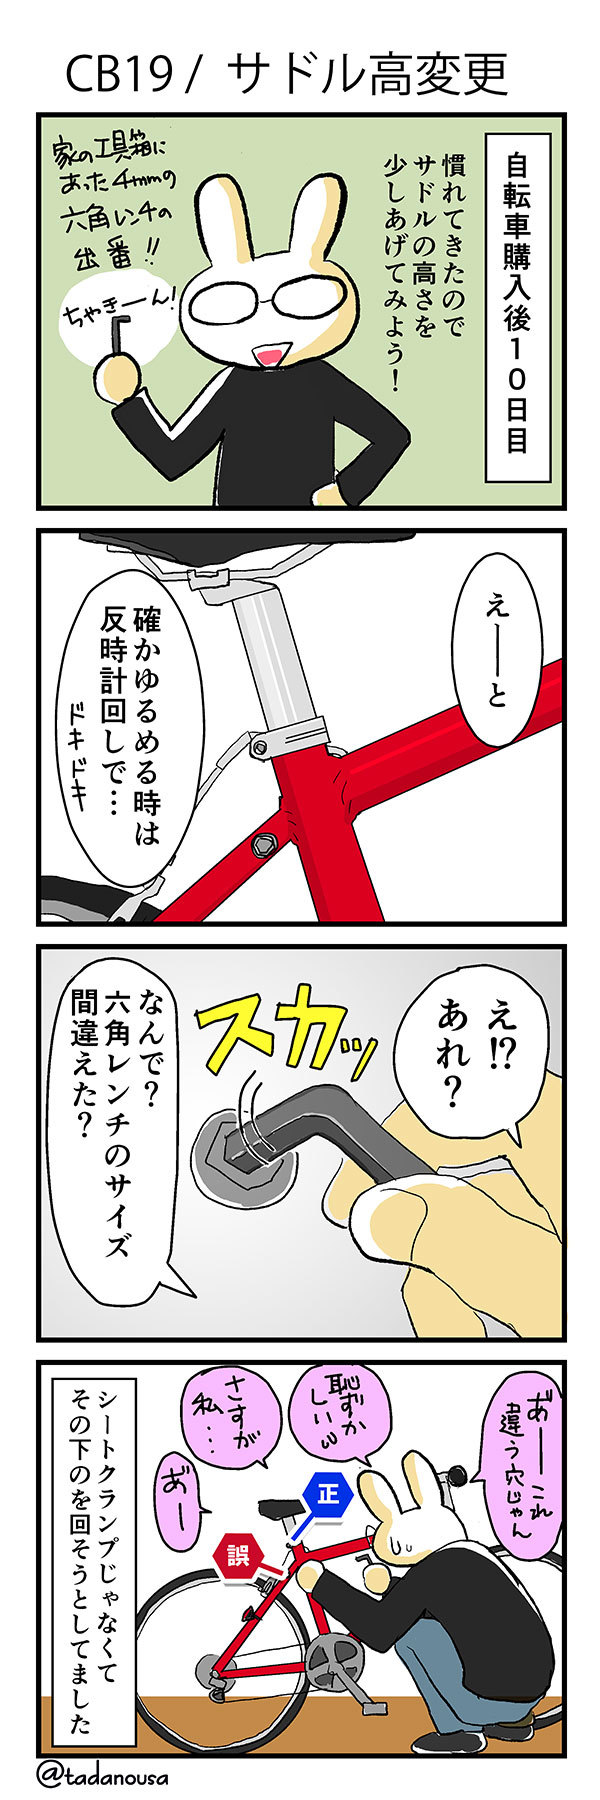 bike_4koma_kako059_s_ketugou.jpg